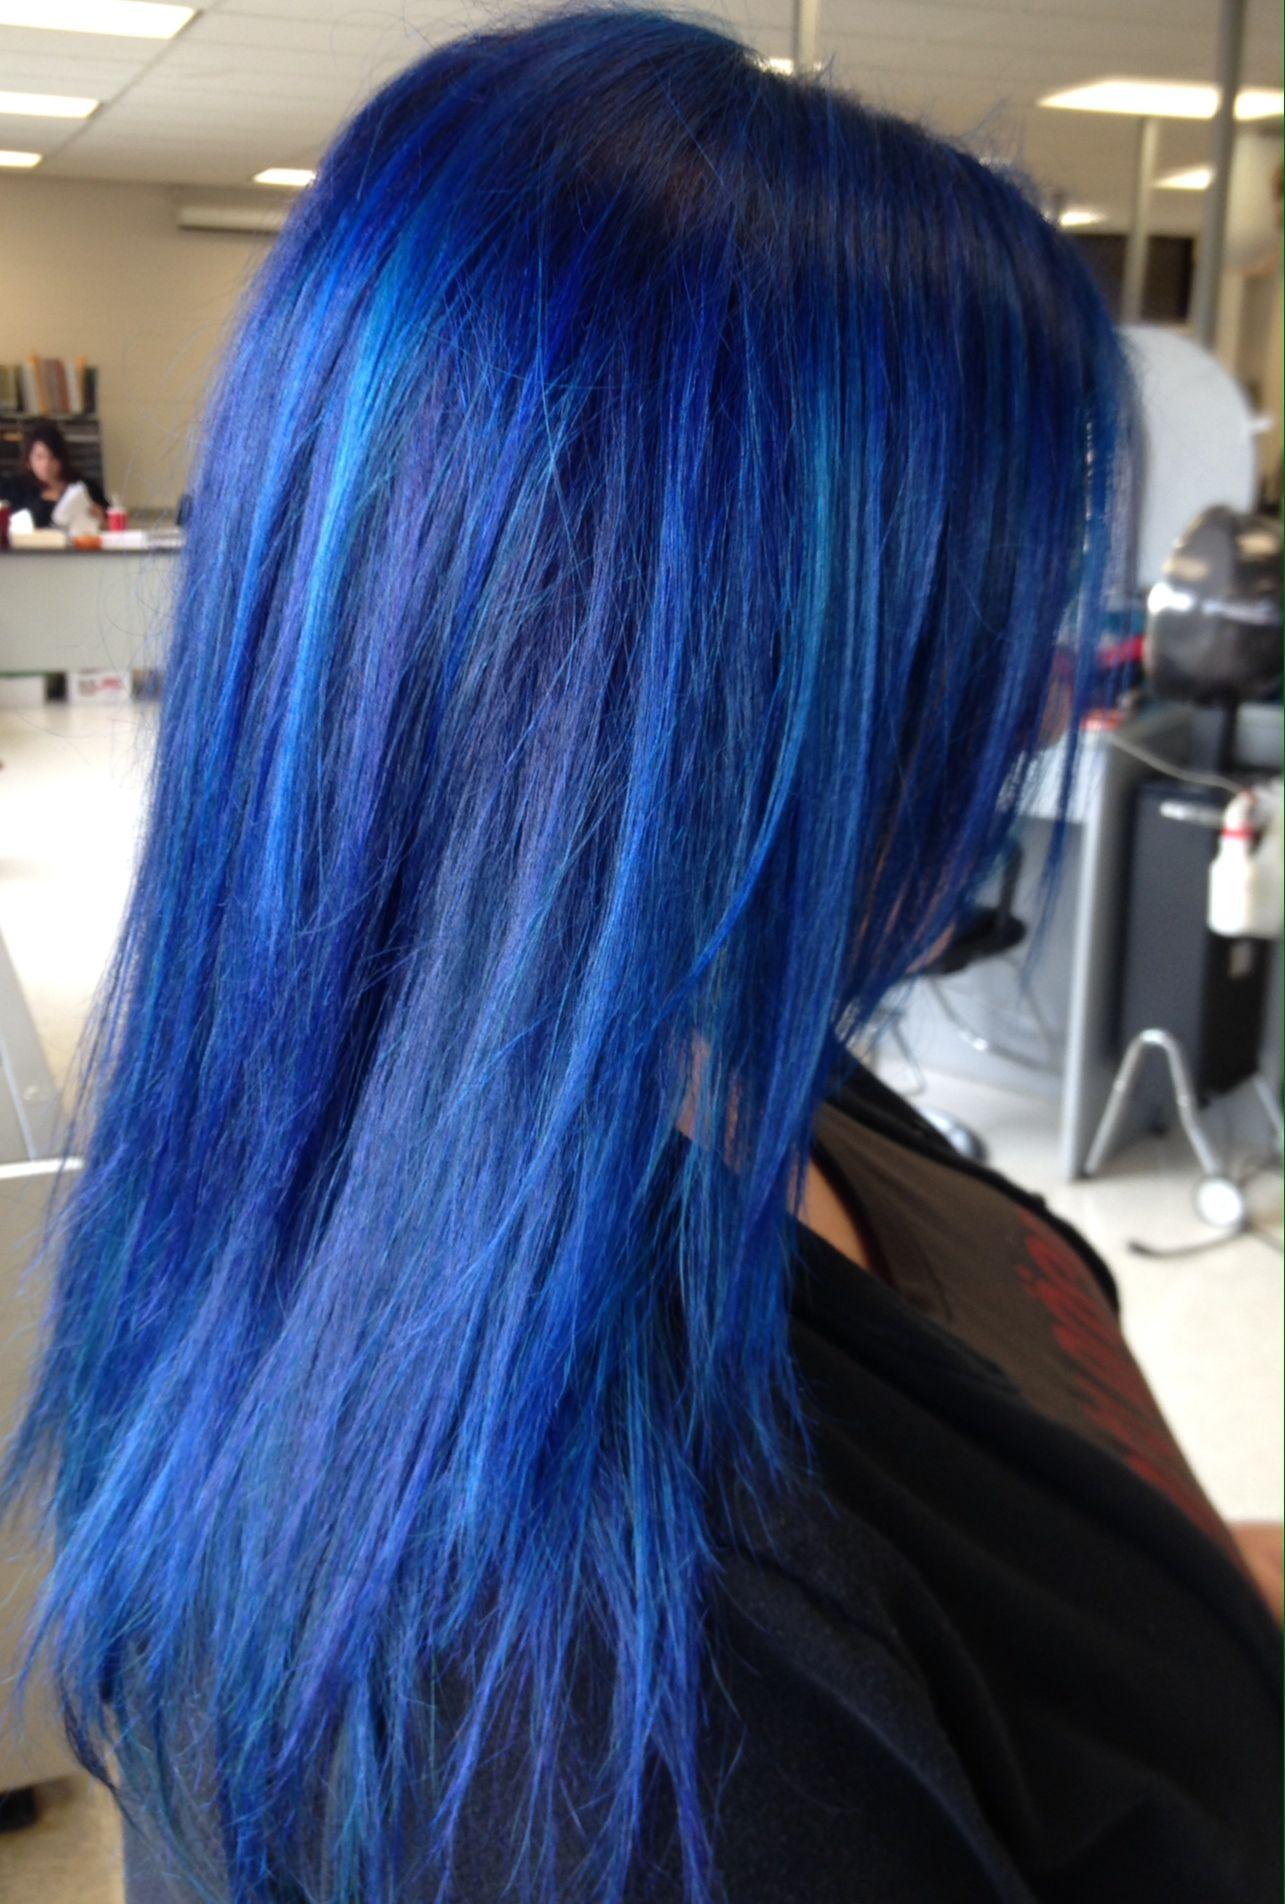 Blue Hair Formula 3 Oz Pravana Vivid Blue To 5 Oz Pravana Vivid Green My Hair Was Very Yellow